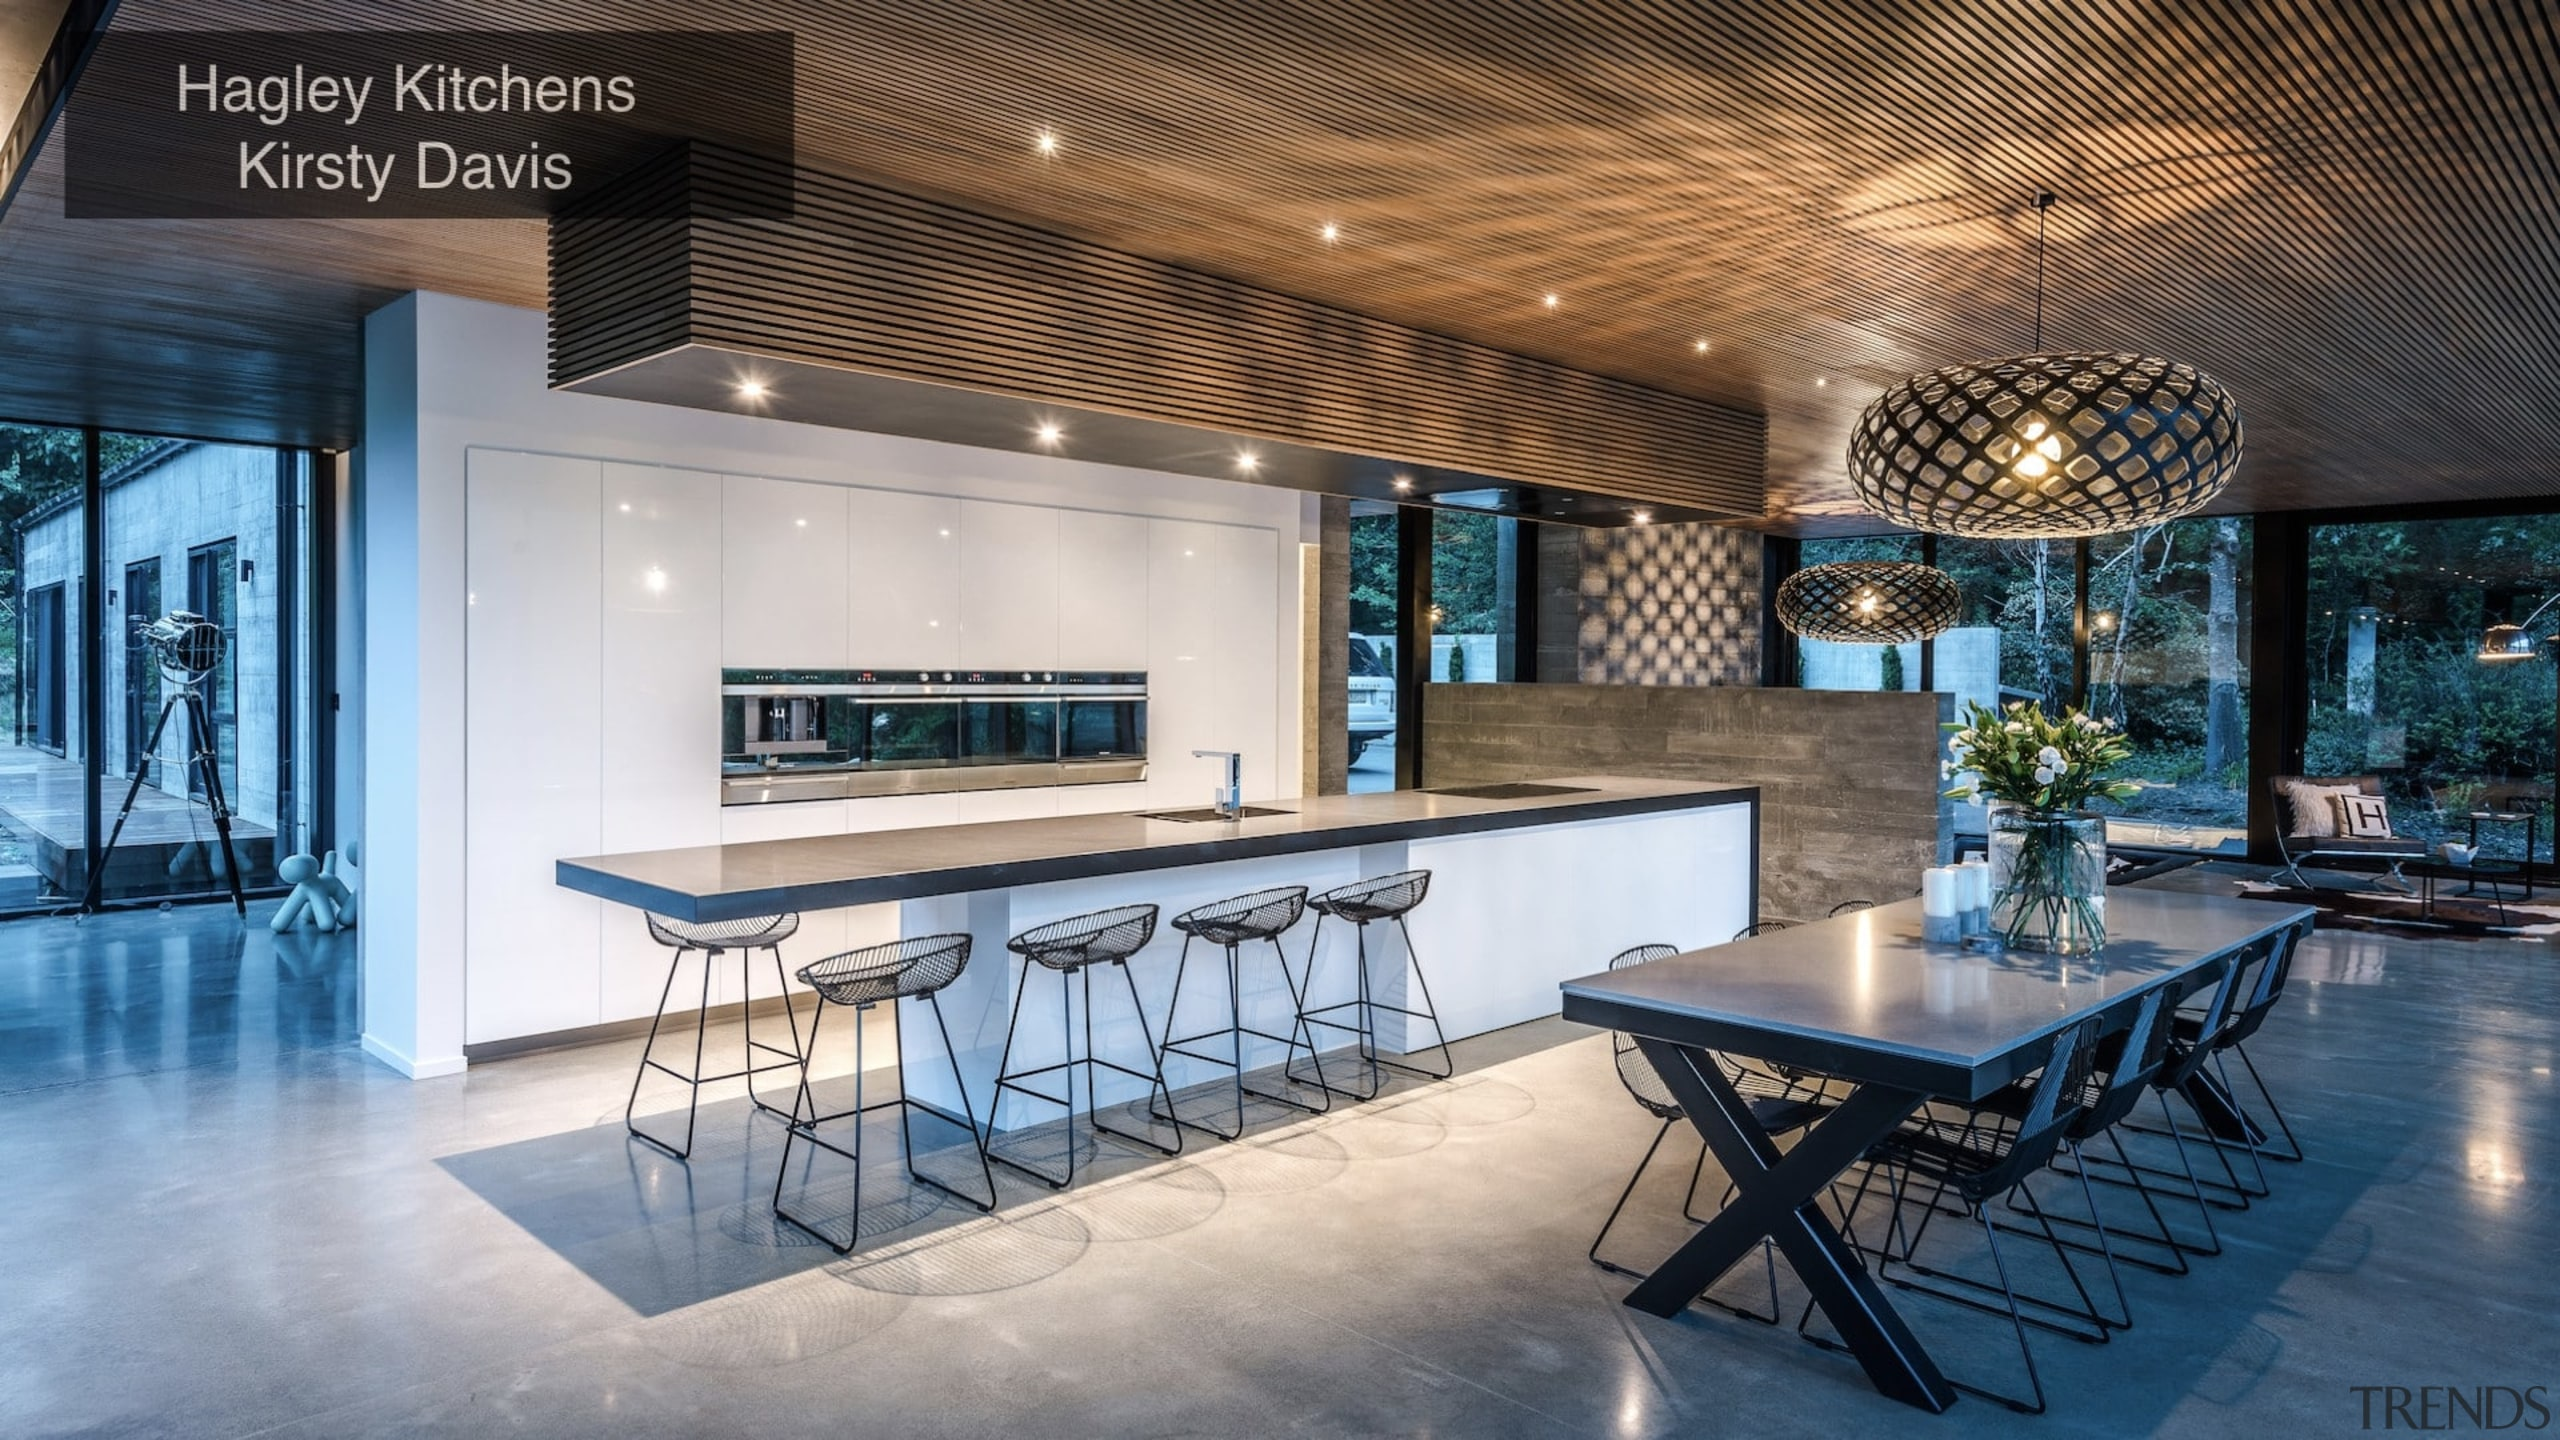 Winner –Hagley Kitchens Kirsty Davis – Tida New architecture, ceiling, estate, home, interior design, real estate, table, gray